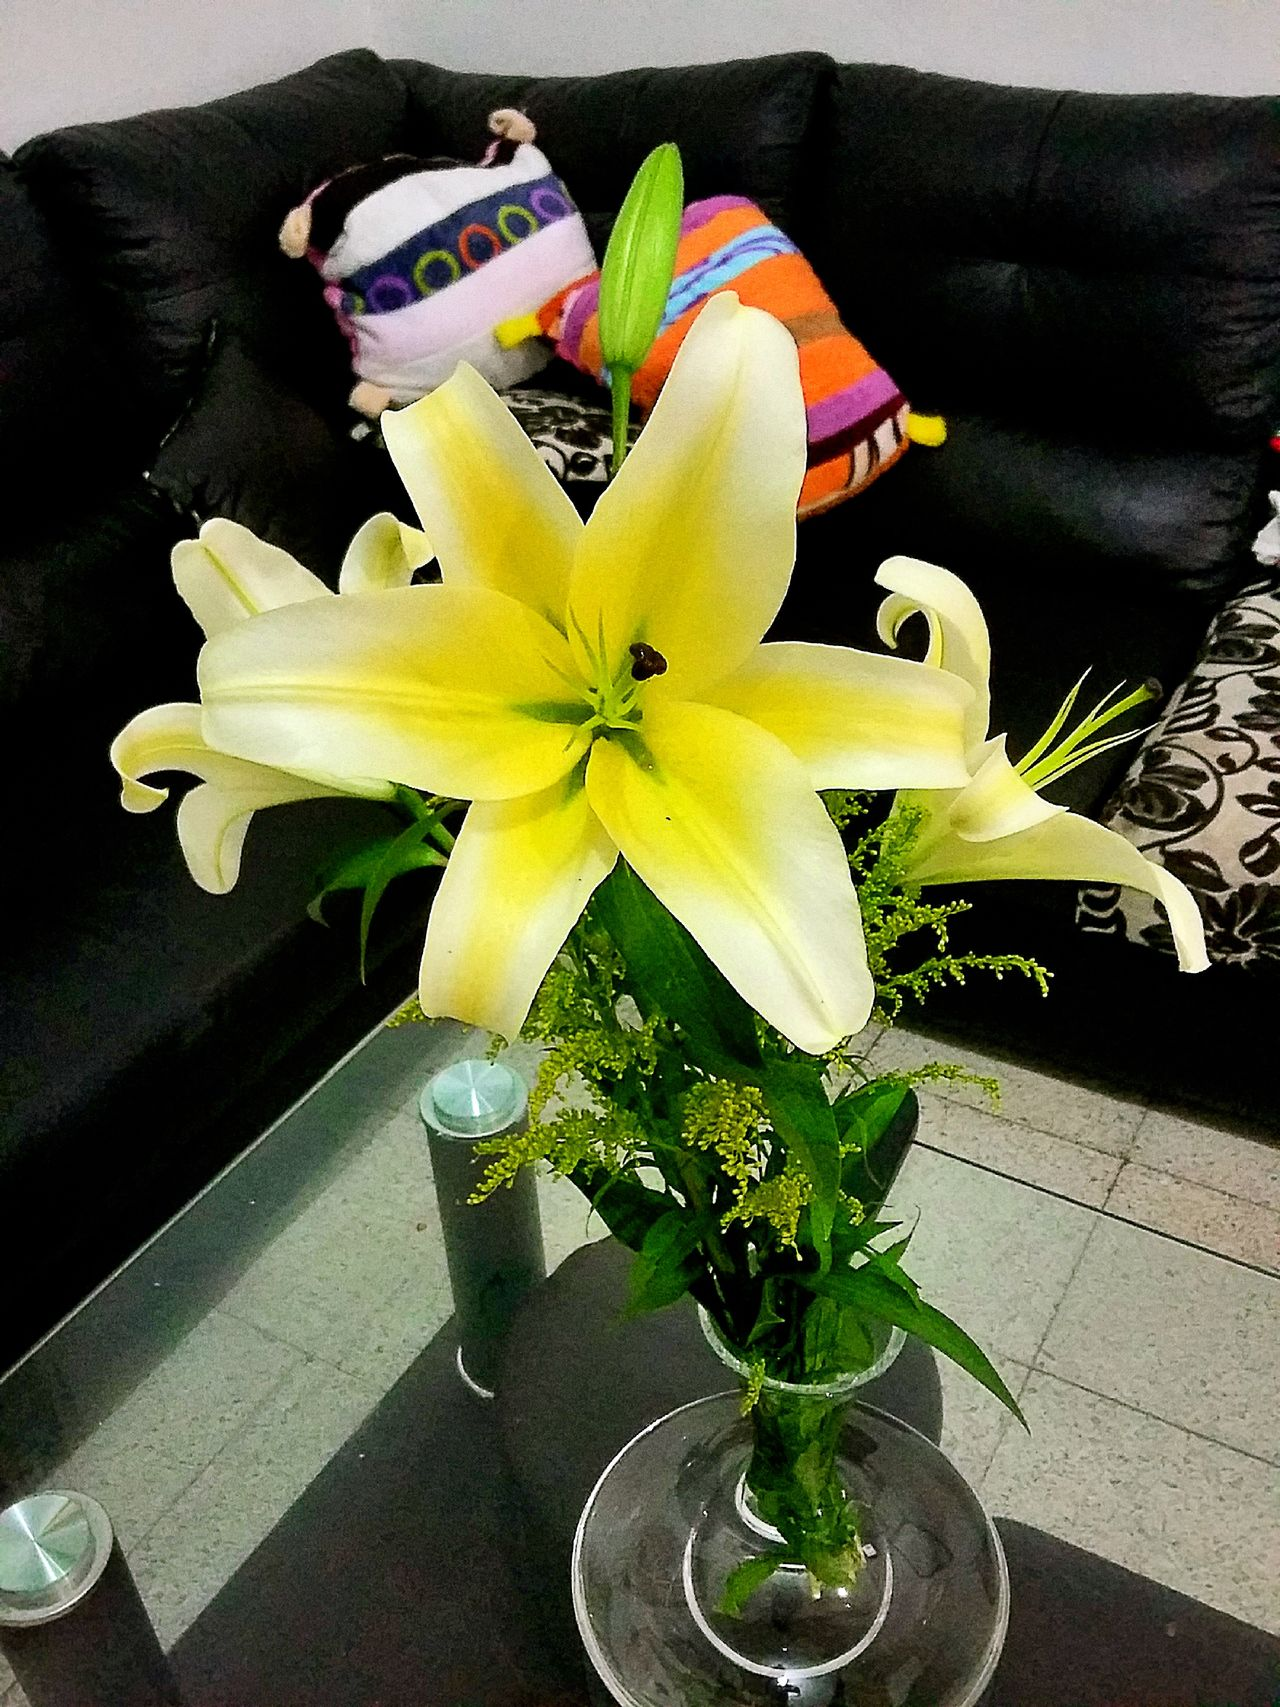 Flowers Enamorado Detalles Romantic Joy Lovely Te Amo♥